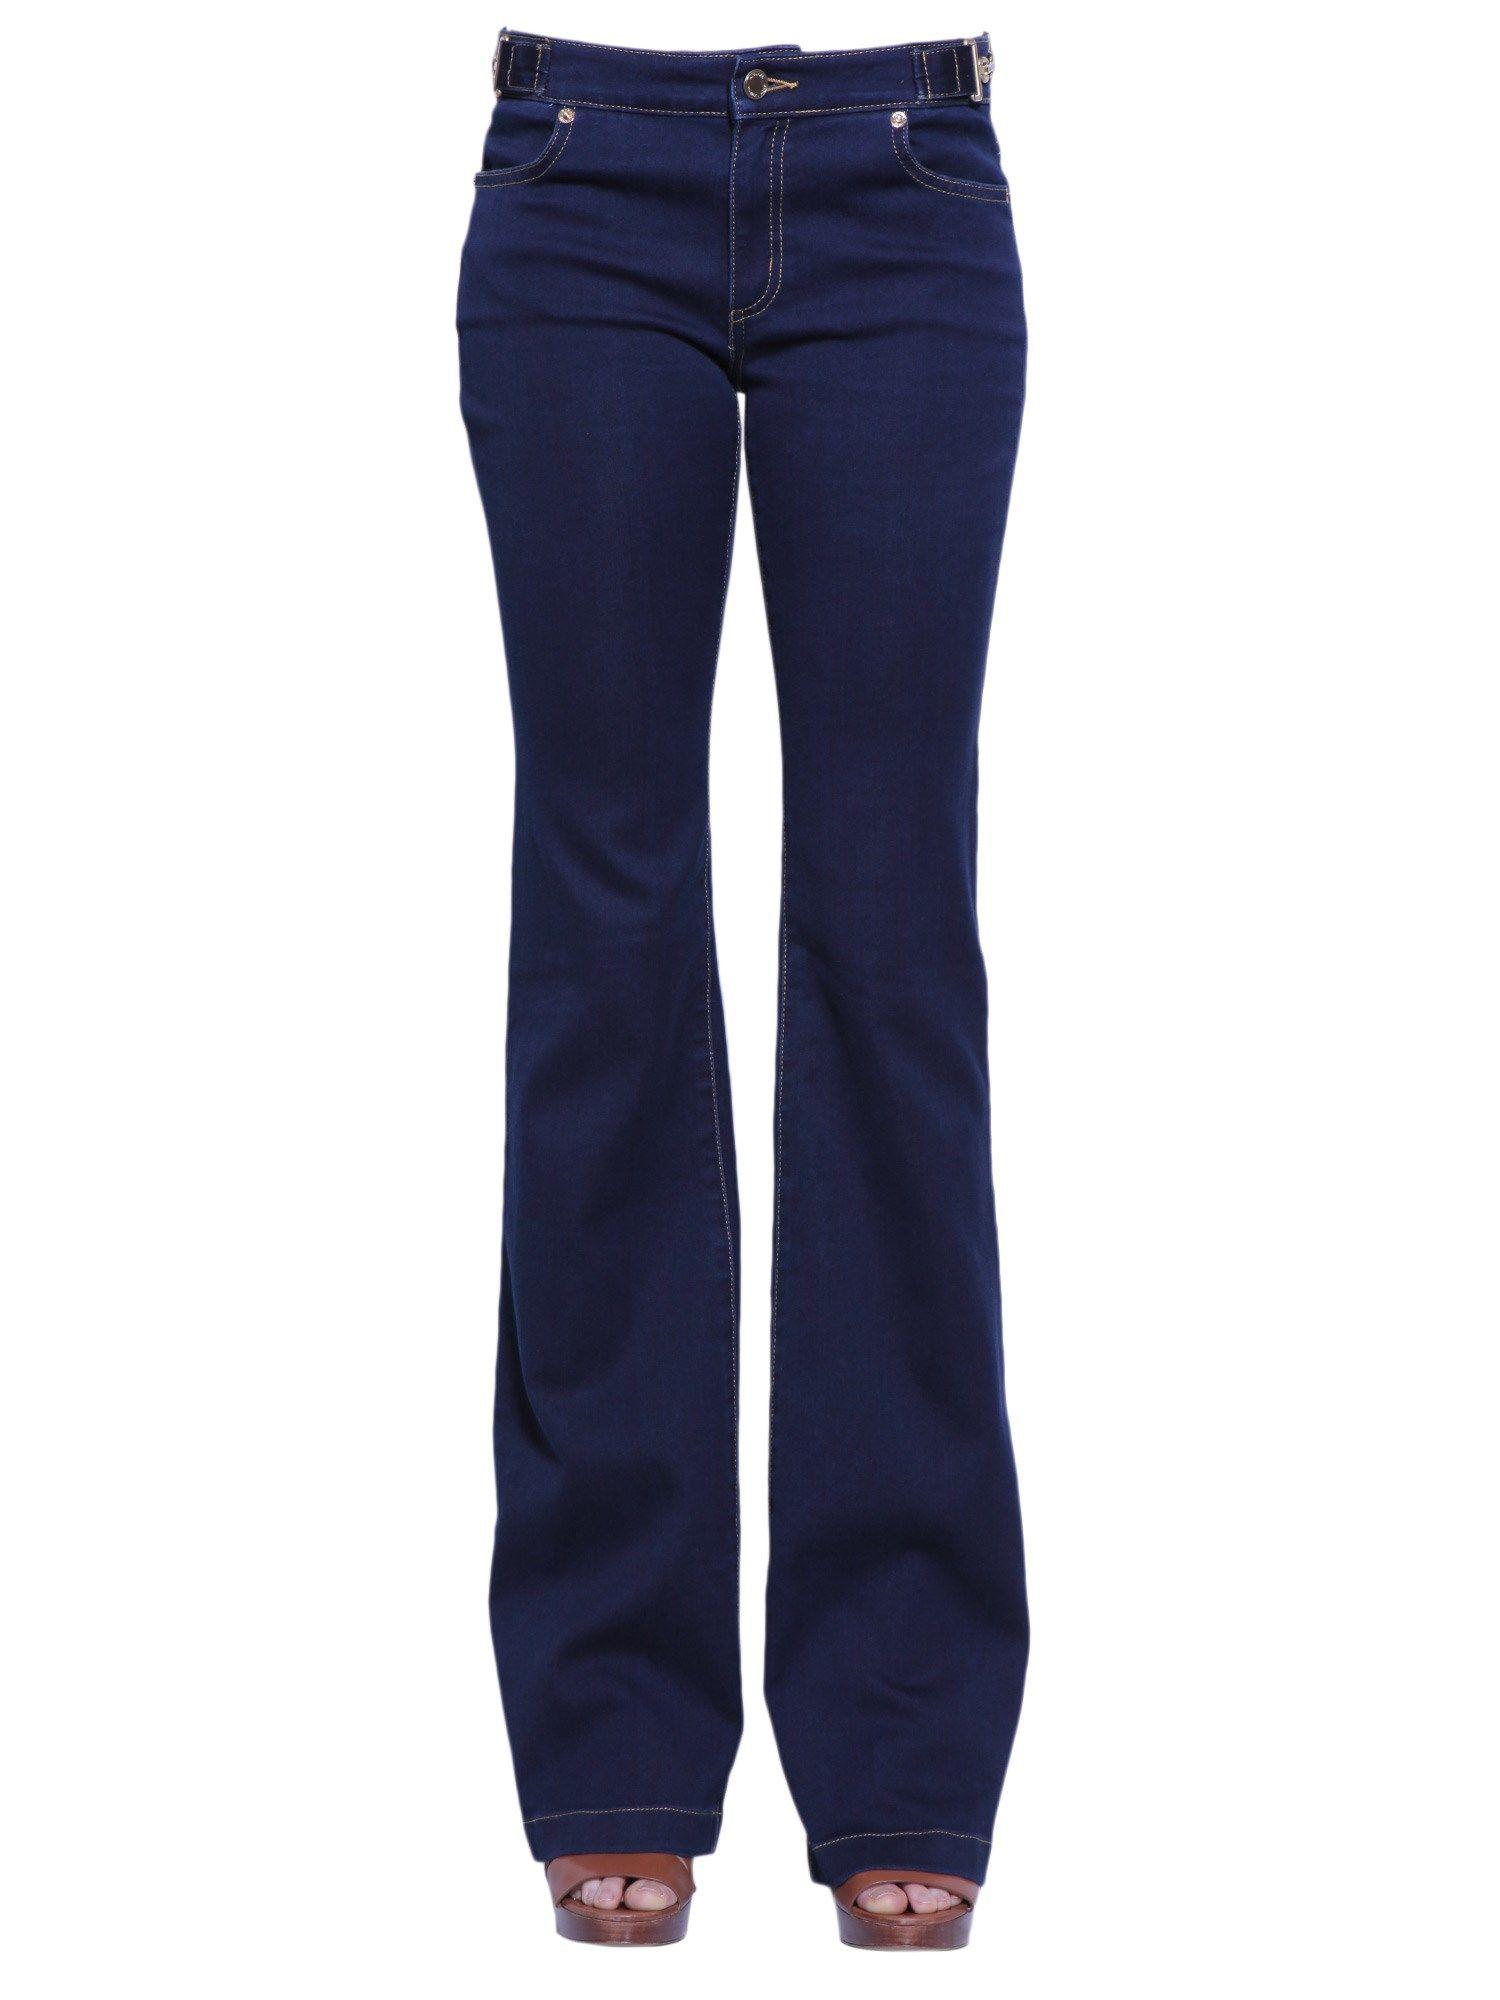 Selma Flare Jeans